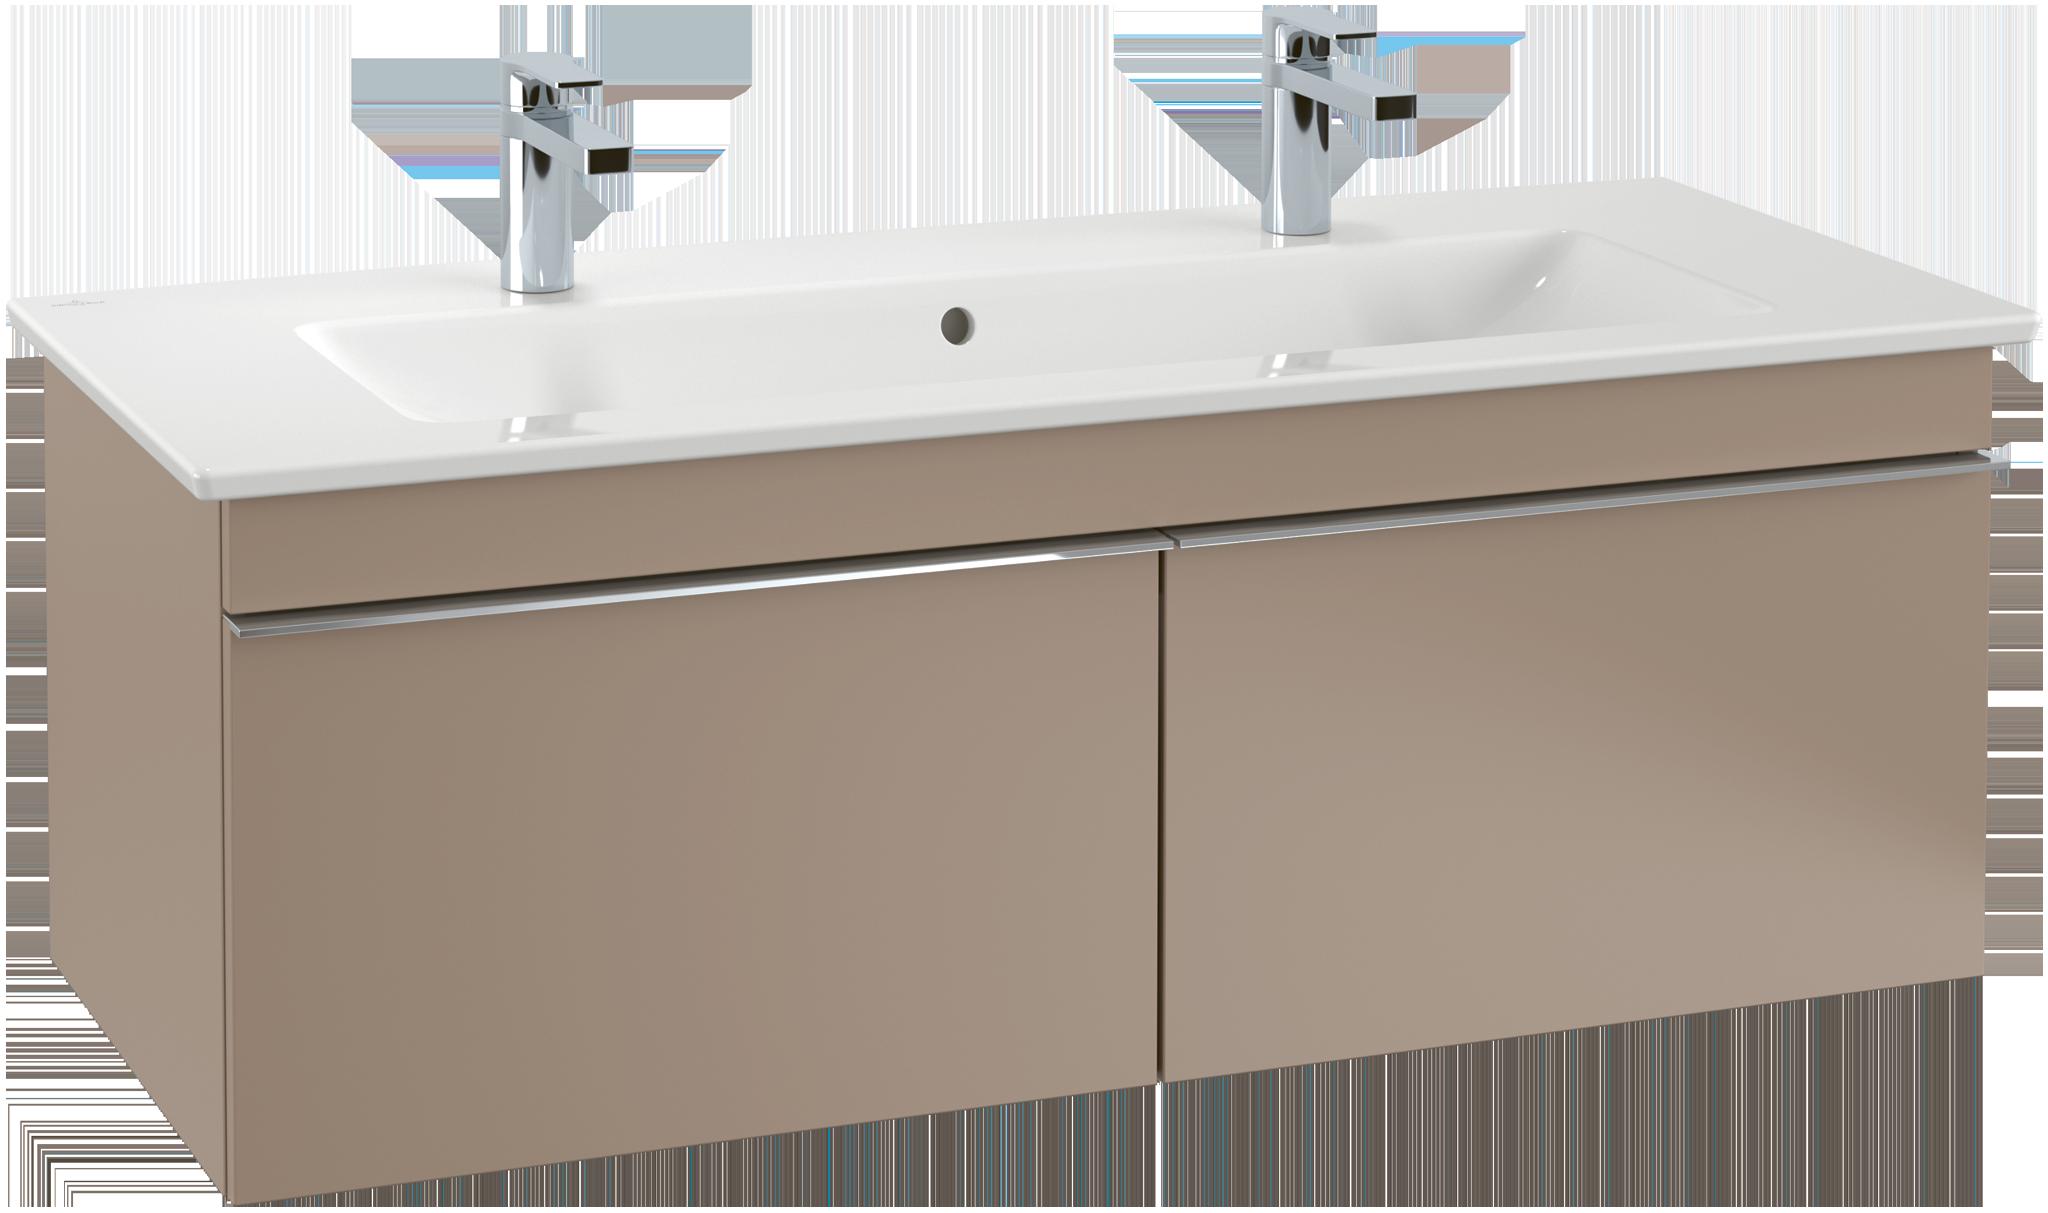 Bathroom washbasin cabinets - Venticello Bathroom Furniture Vanity Unit For Washbasin Bathroom Sink Cabinets